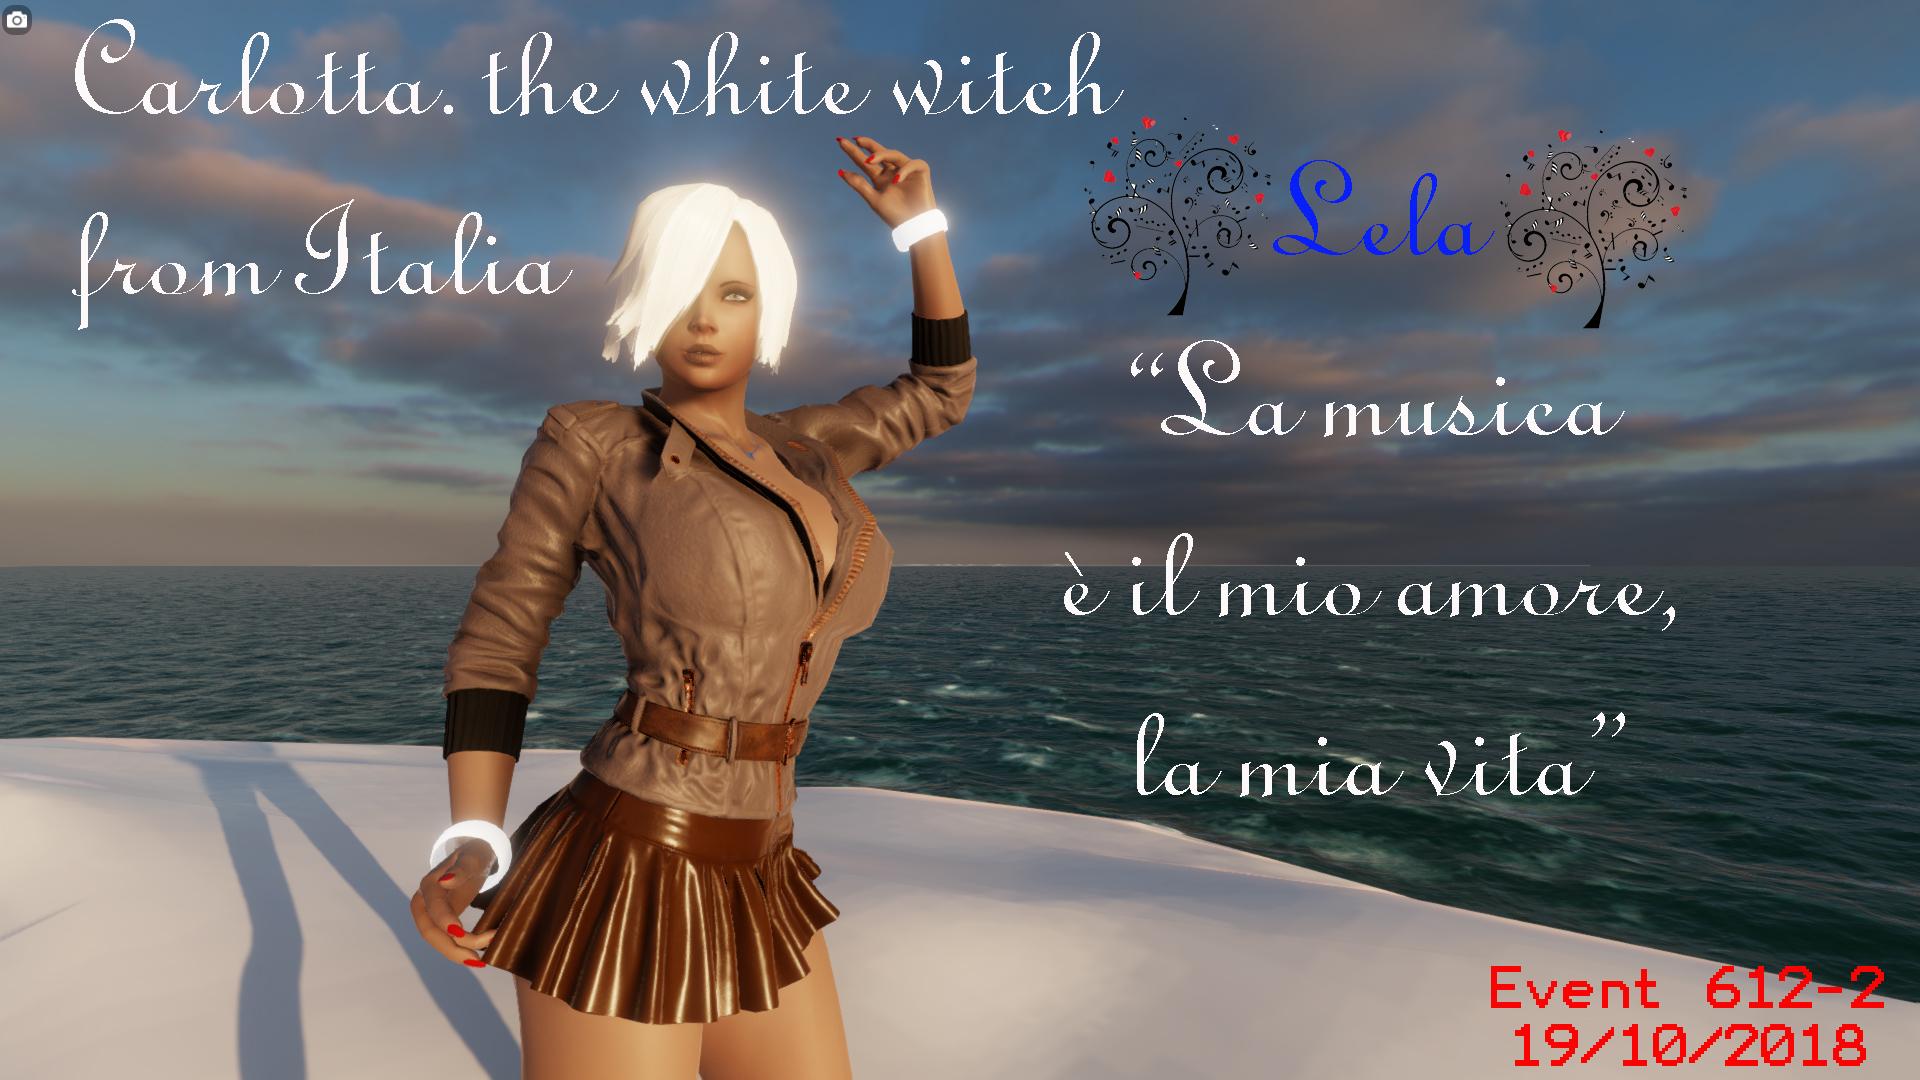 Carlotta_612-2_copia.jpg